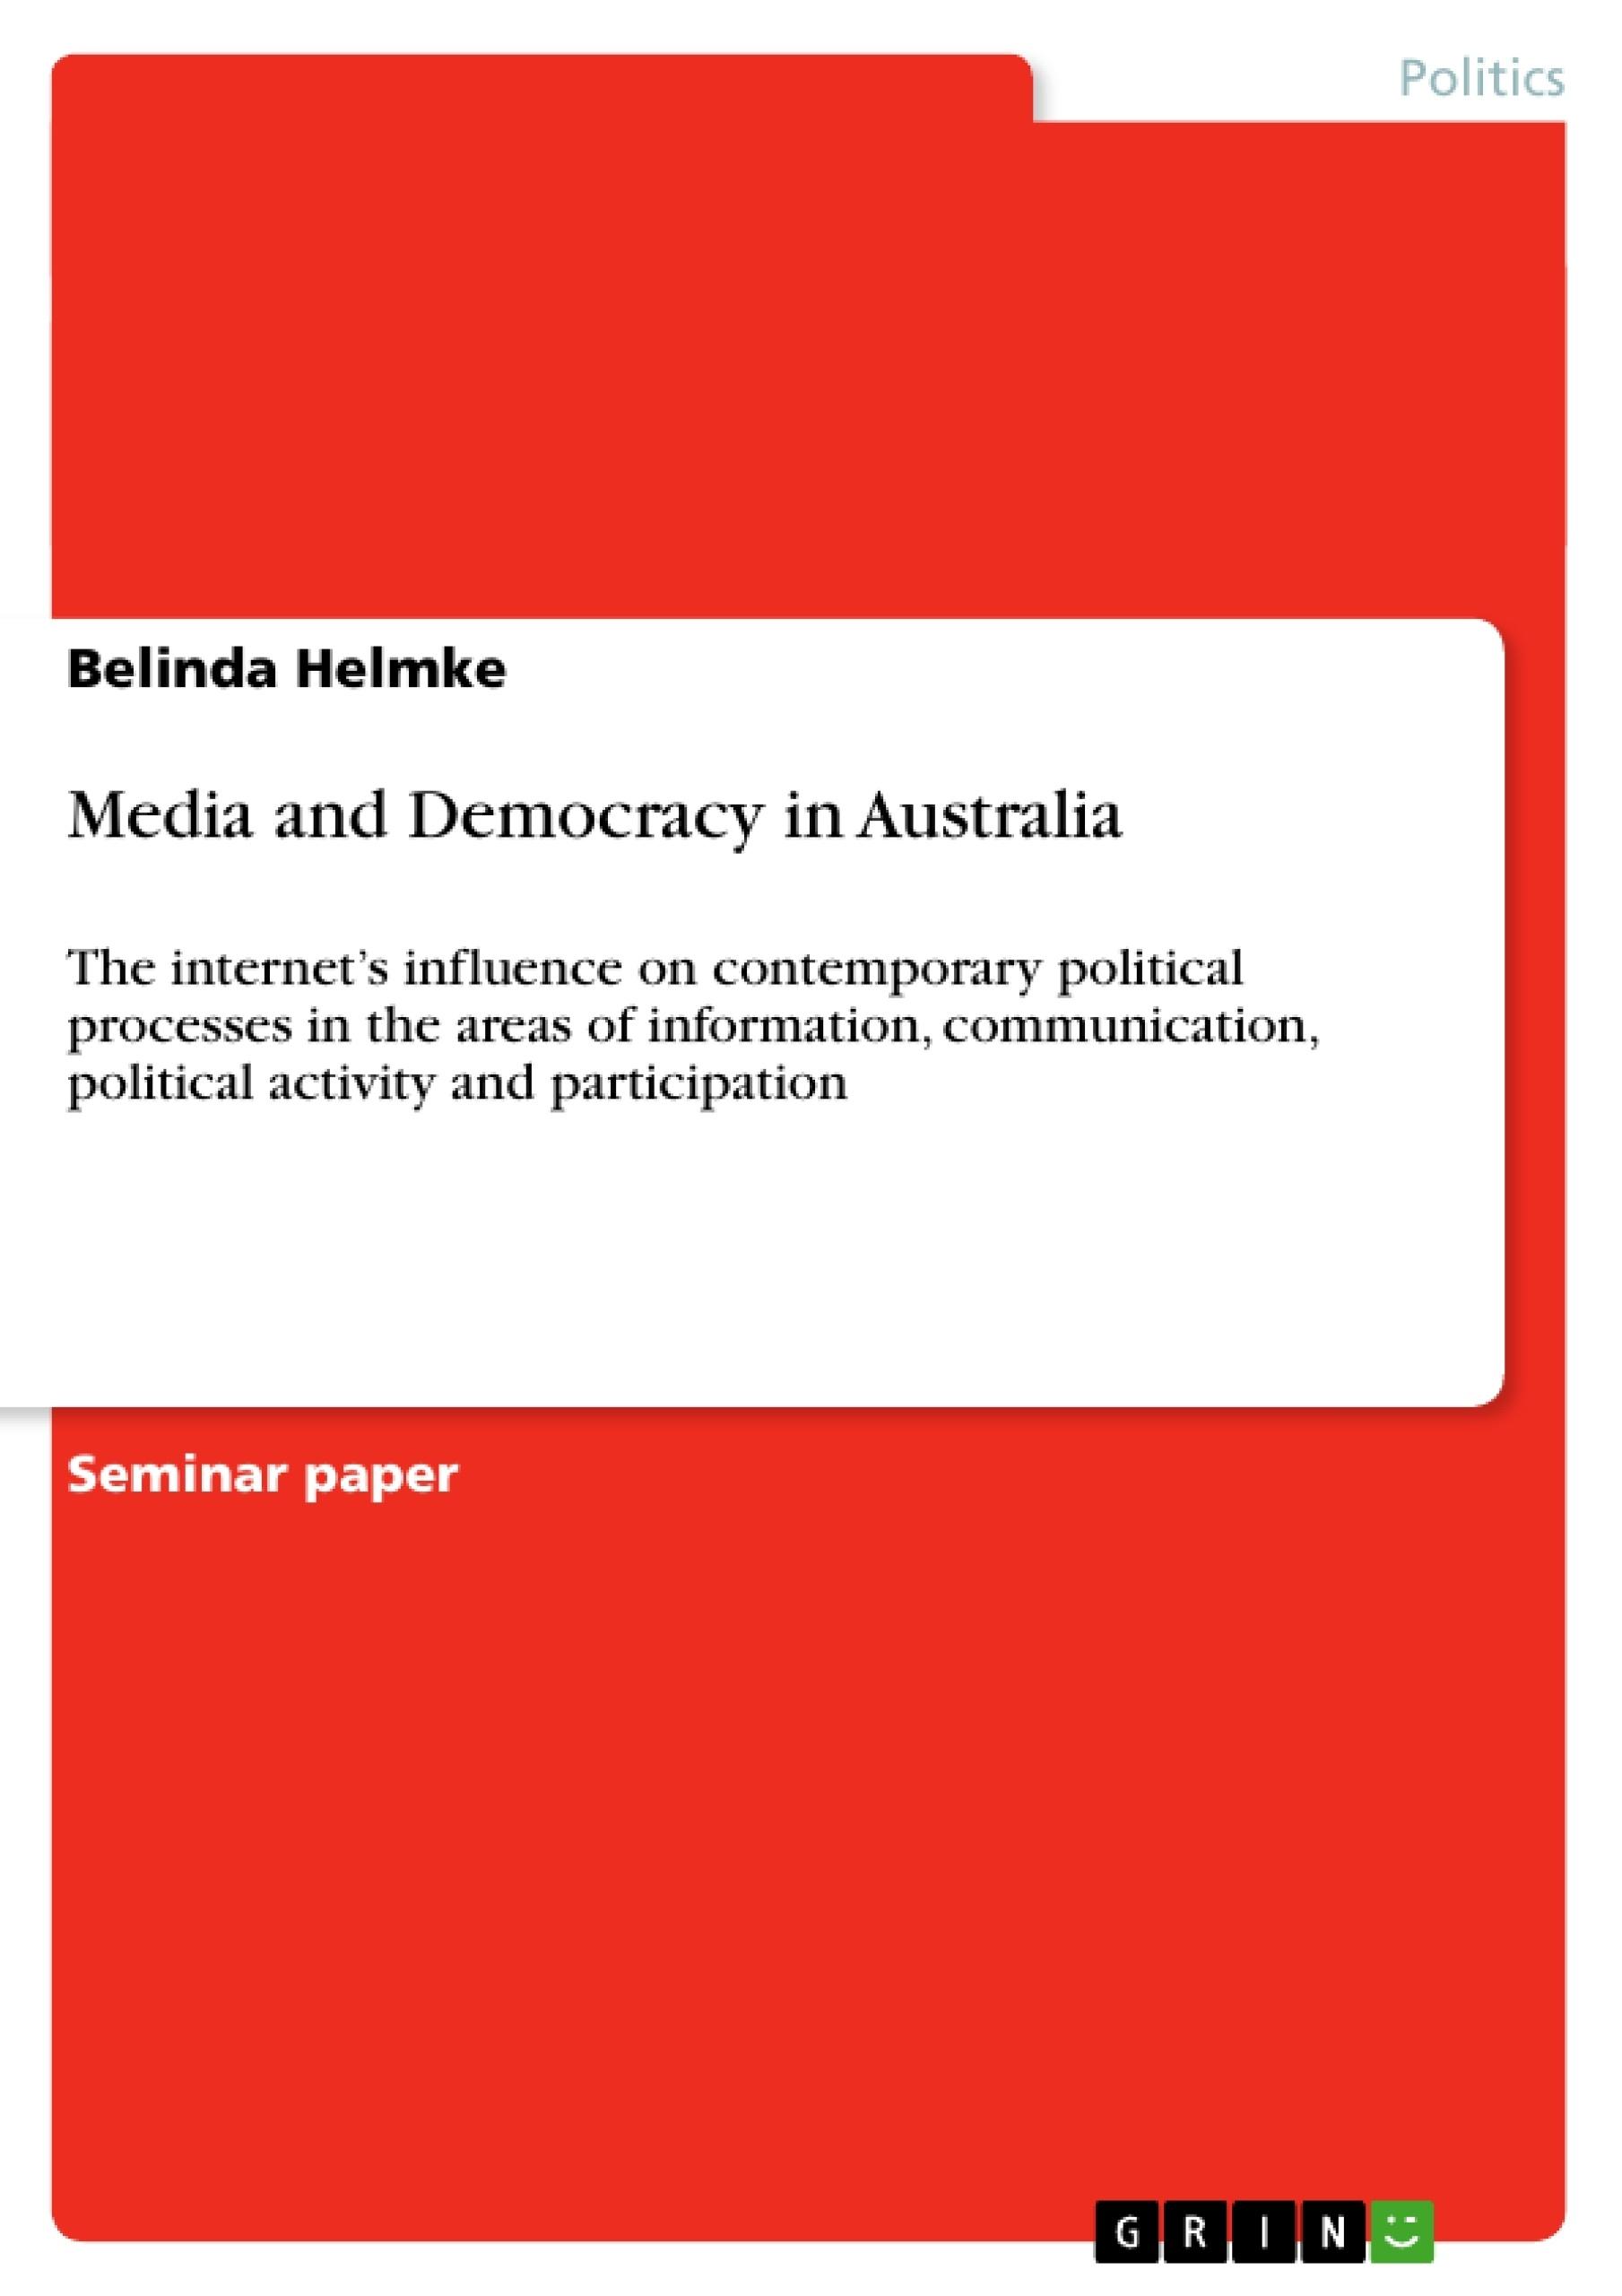 Title: Media and Democracy in Australia